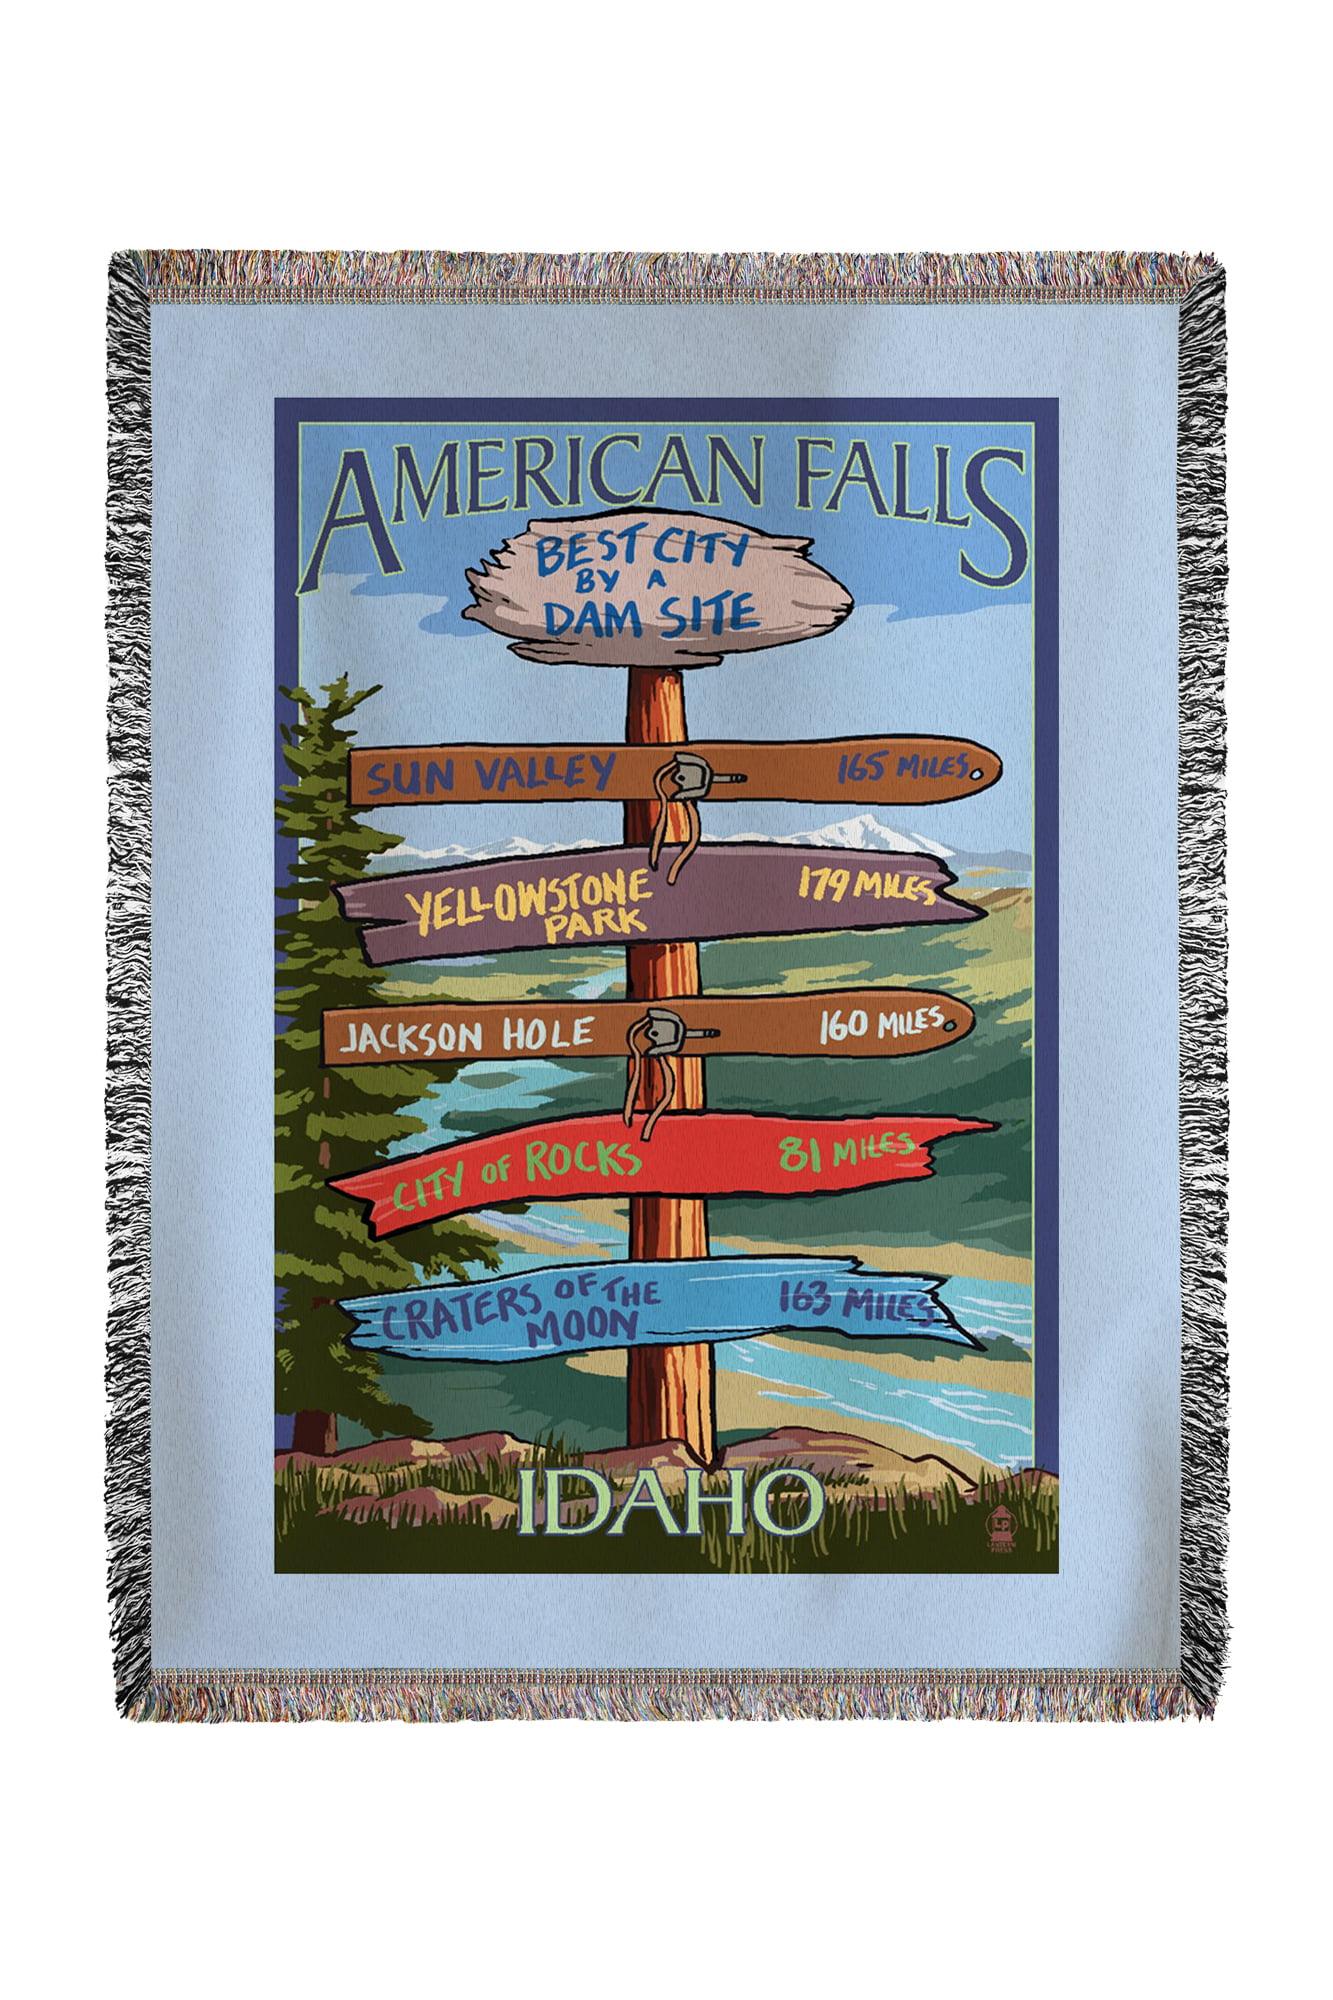 American Falls, Idaho Sign Post Lantern Press Artwork (60x80 Woven Chenille Yarn Blanket) by Lantern Press